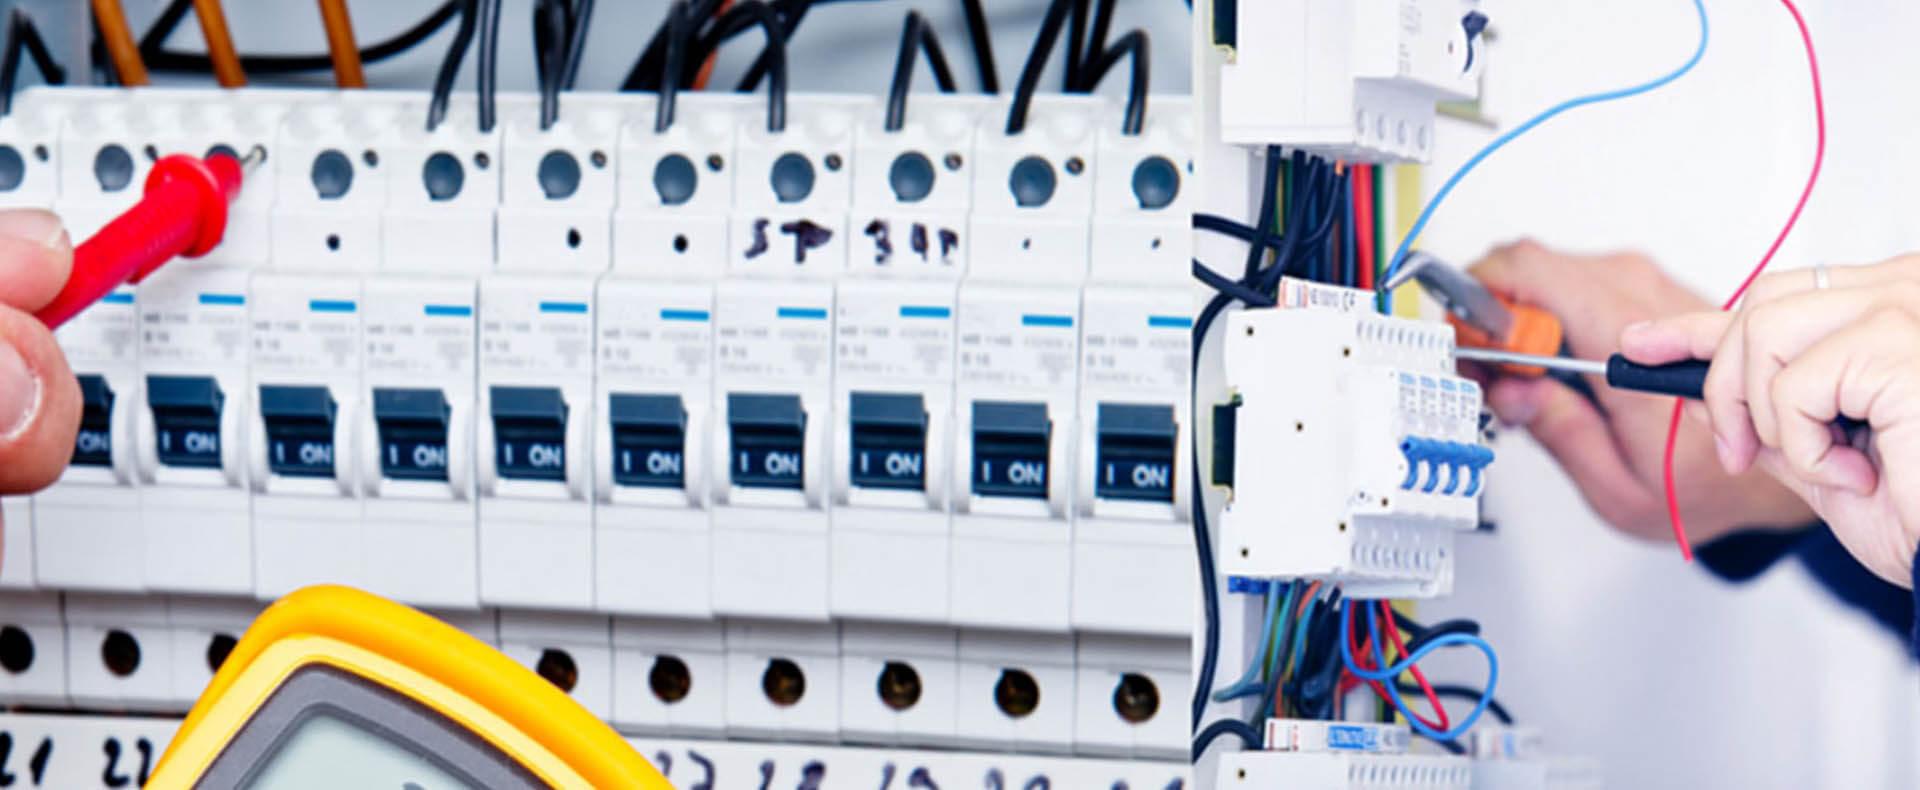 Konya Elektrikçi – Konya Elektrik Ustası – Emin Elektrik